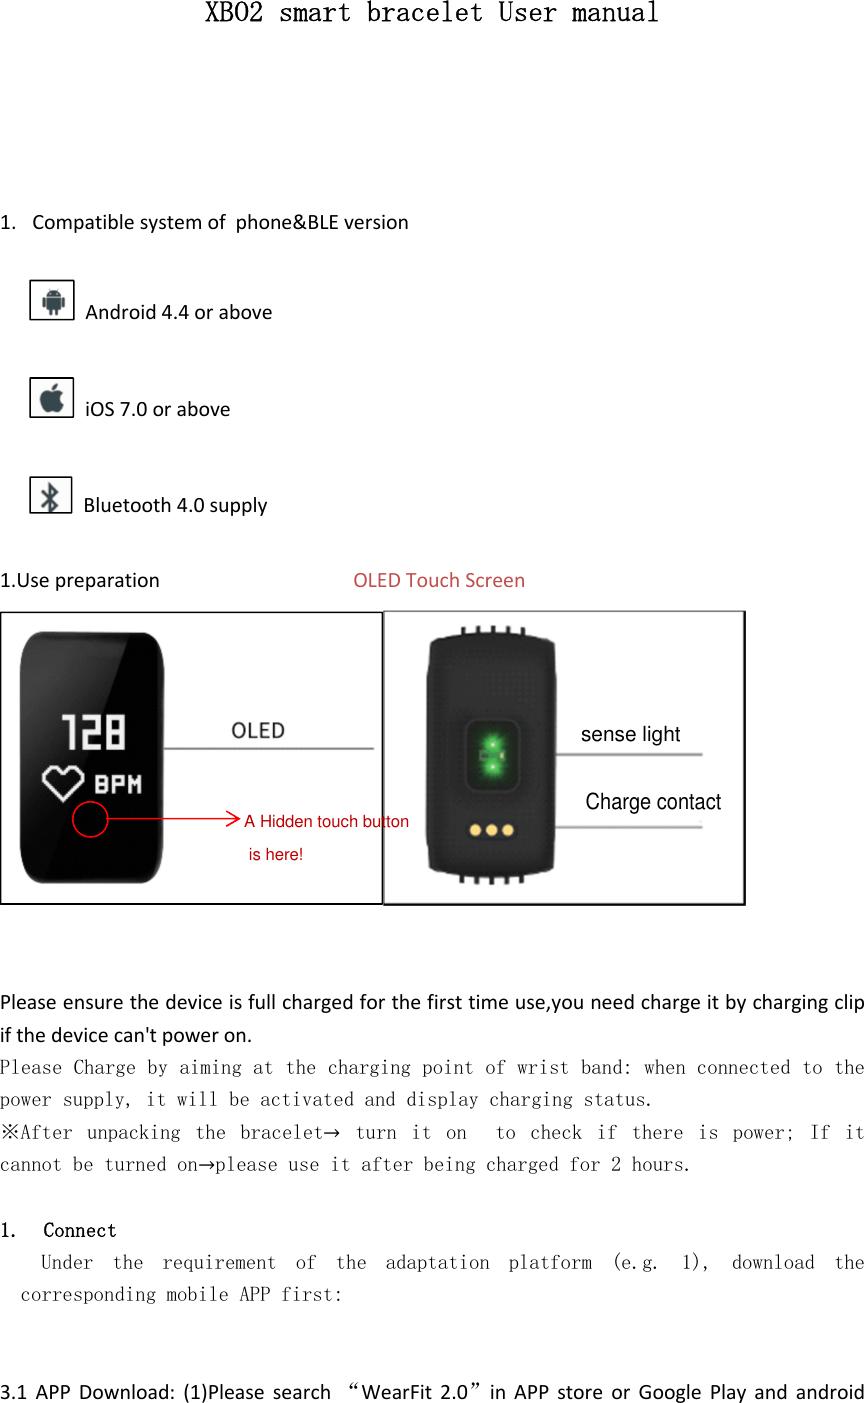 INFINIX MOBILITY XB02 Smart Bracelet User Manual